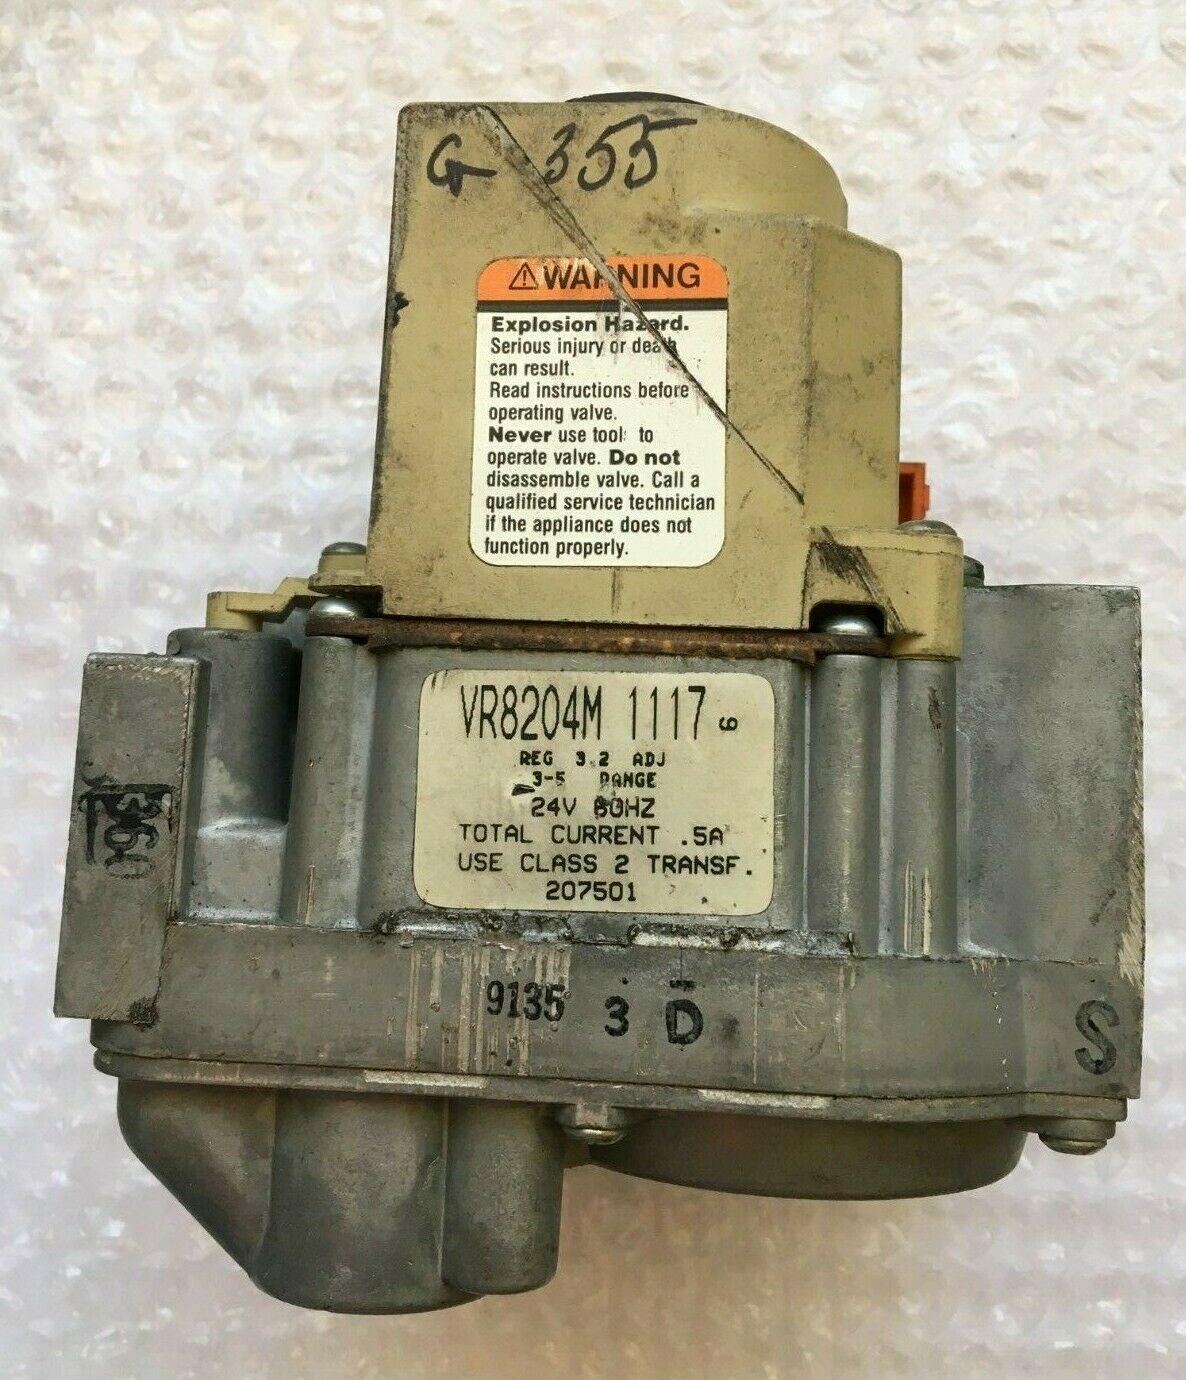 Honeywell VR8204M1117 HVAC Furnace Gas Valve 207501 used #G355 - $50.96